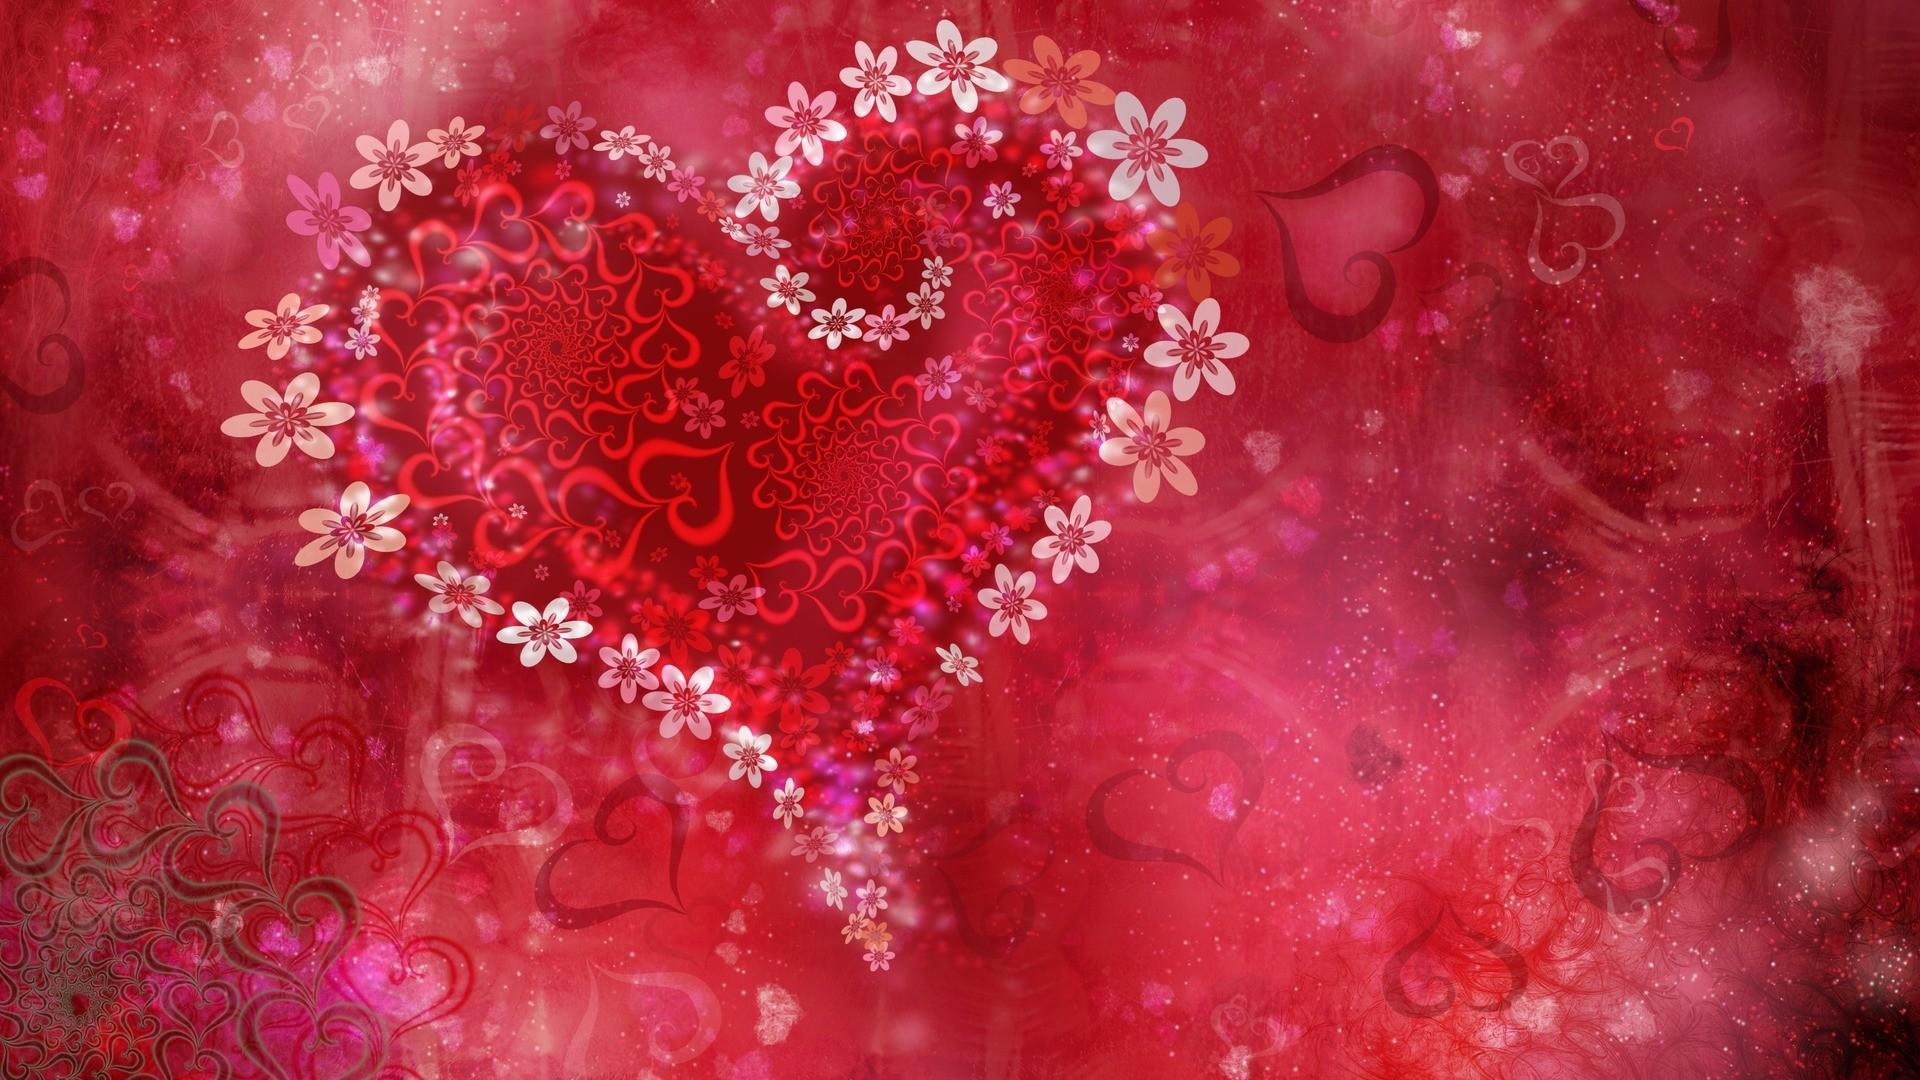 Love Heart Flowers Wallpapers   HD Wallpapers